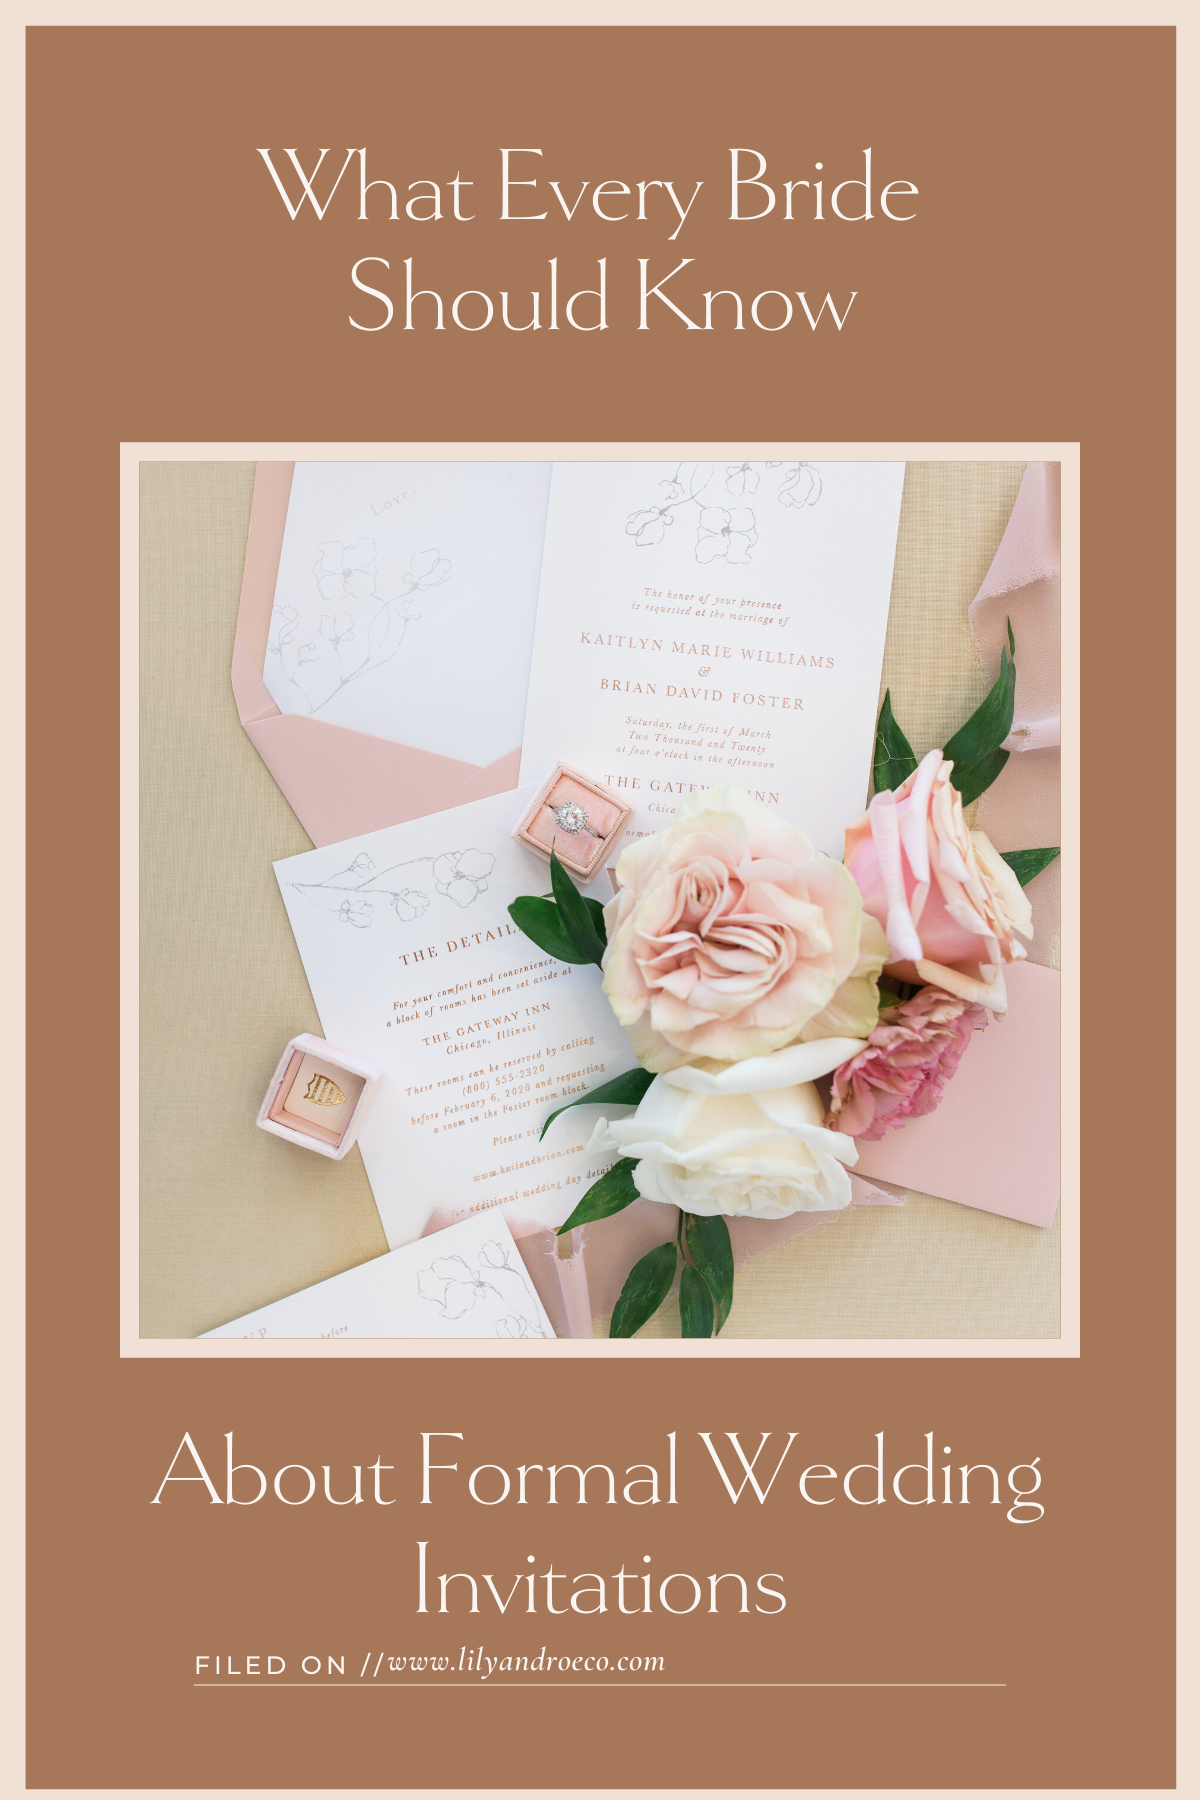 Formal Wedding Invitation Wording Examples & Pro Tips in